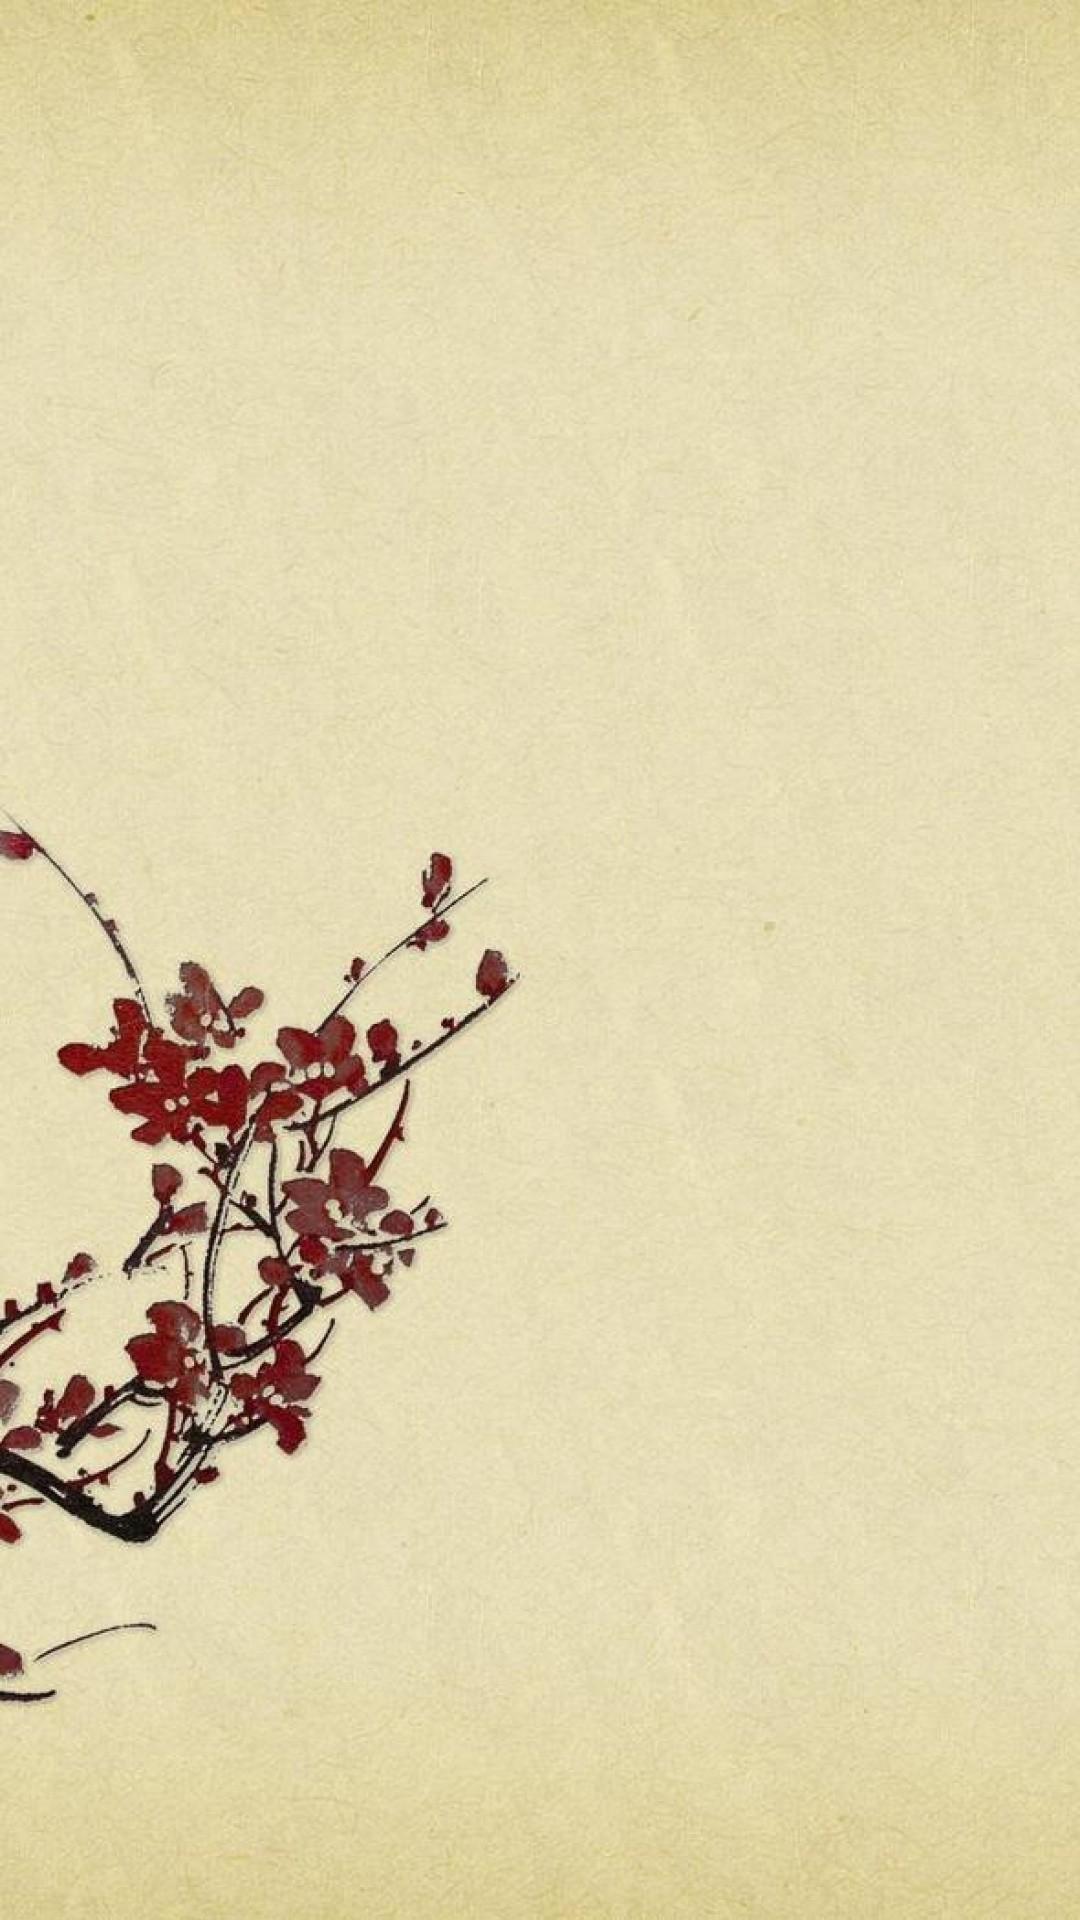 Res: 1080x1920, japanese art wallpaper #101919 .